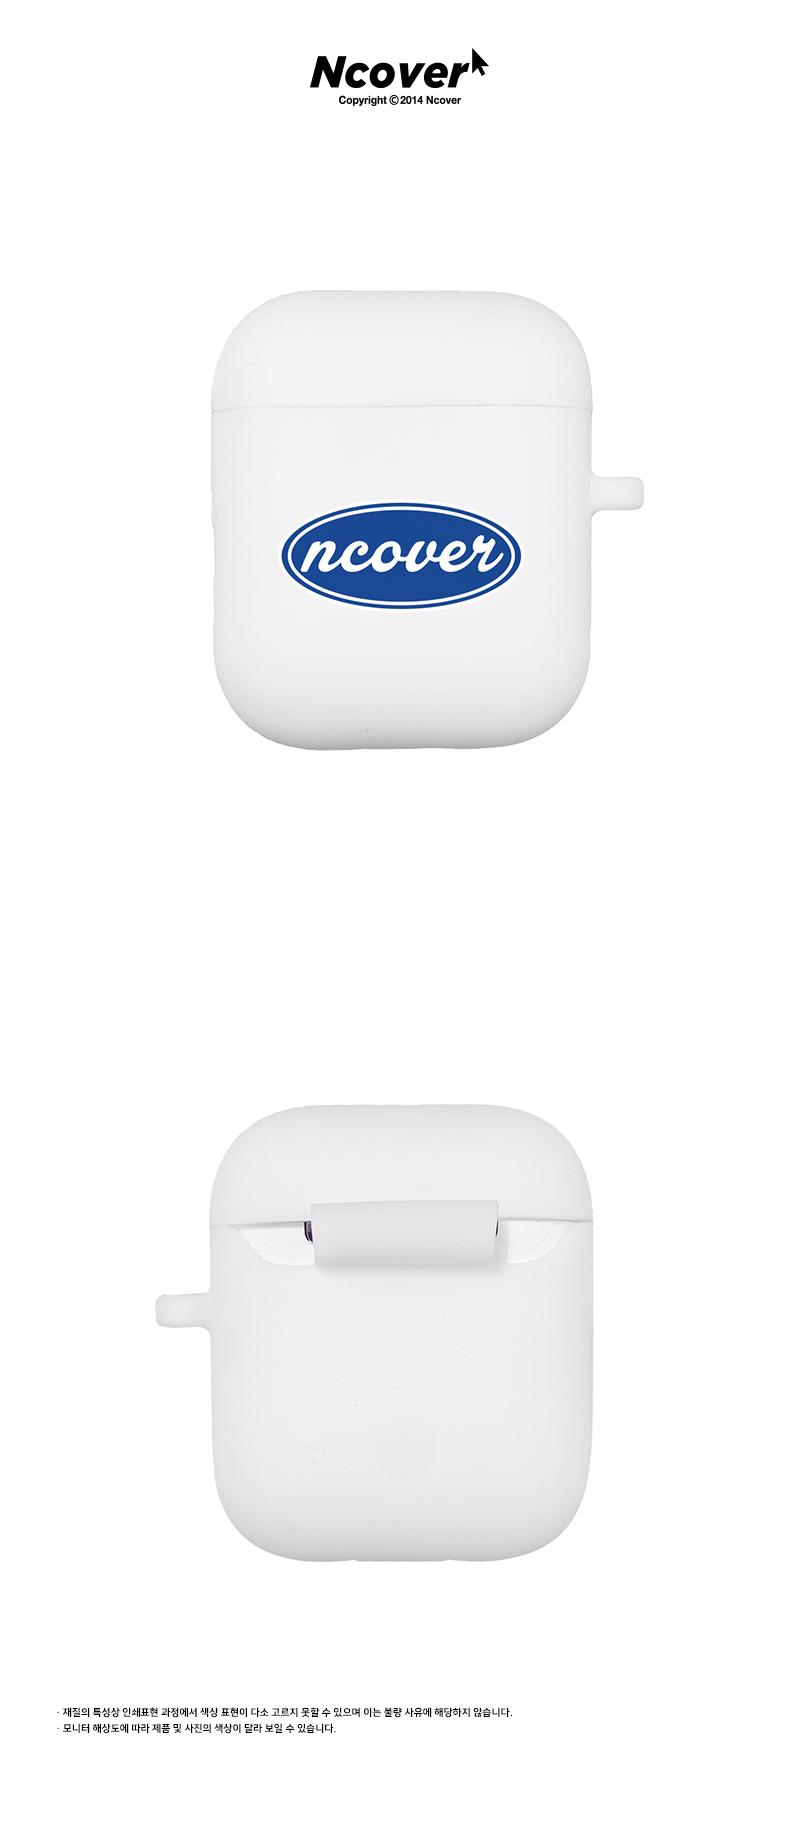 original logo-white(airpod case).jpg